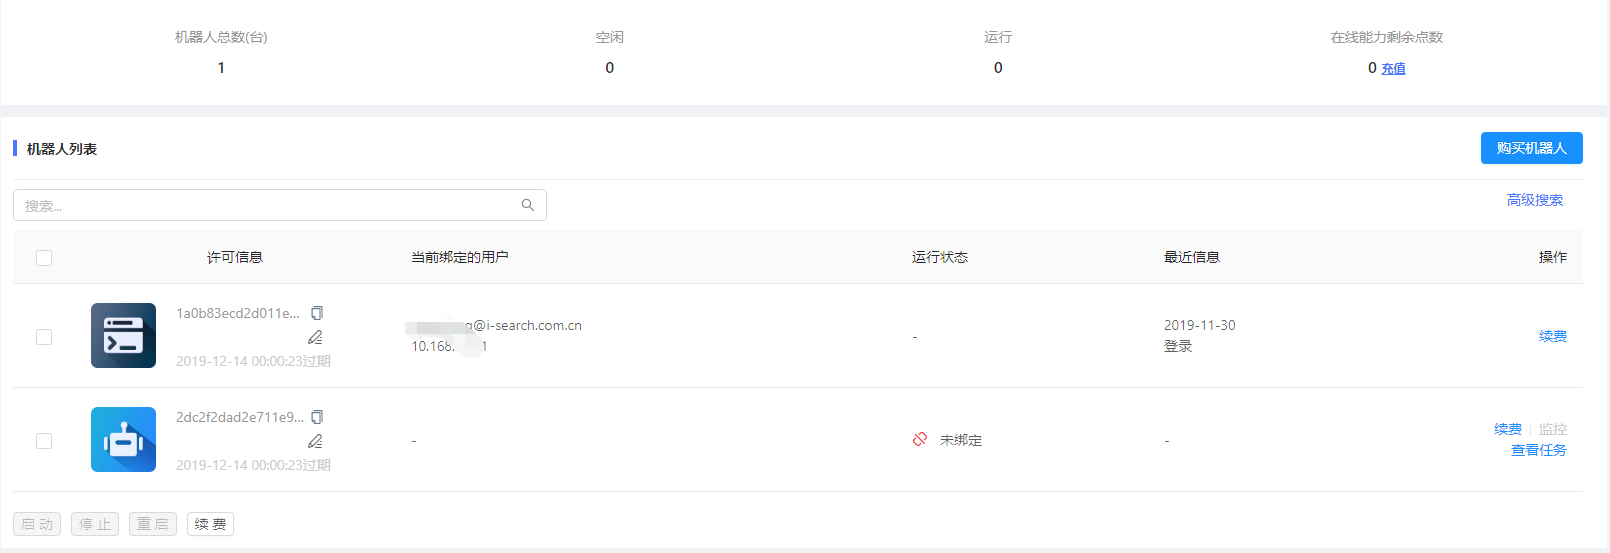 【iS-RPA10.2 优化体验】(5) - 村里通网了,真快!